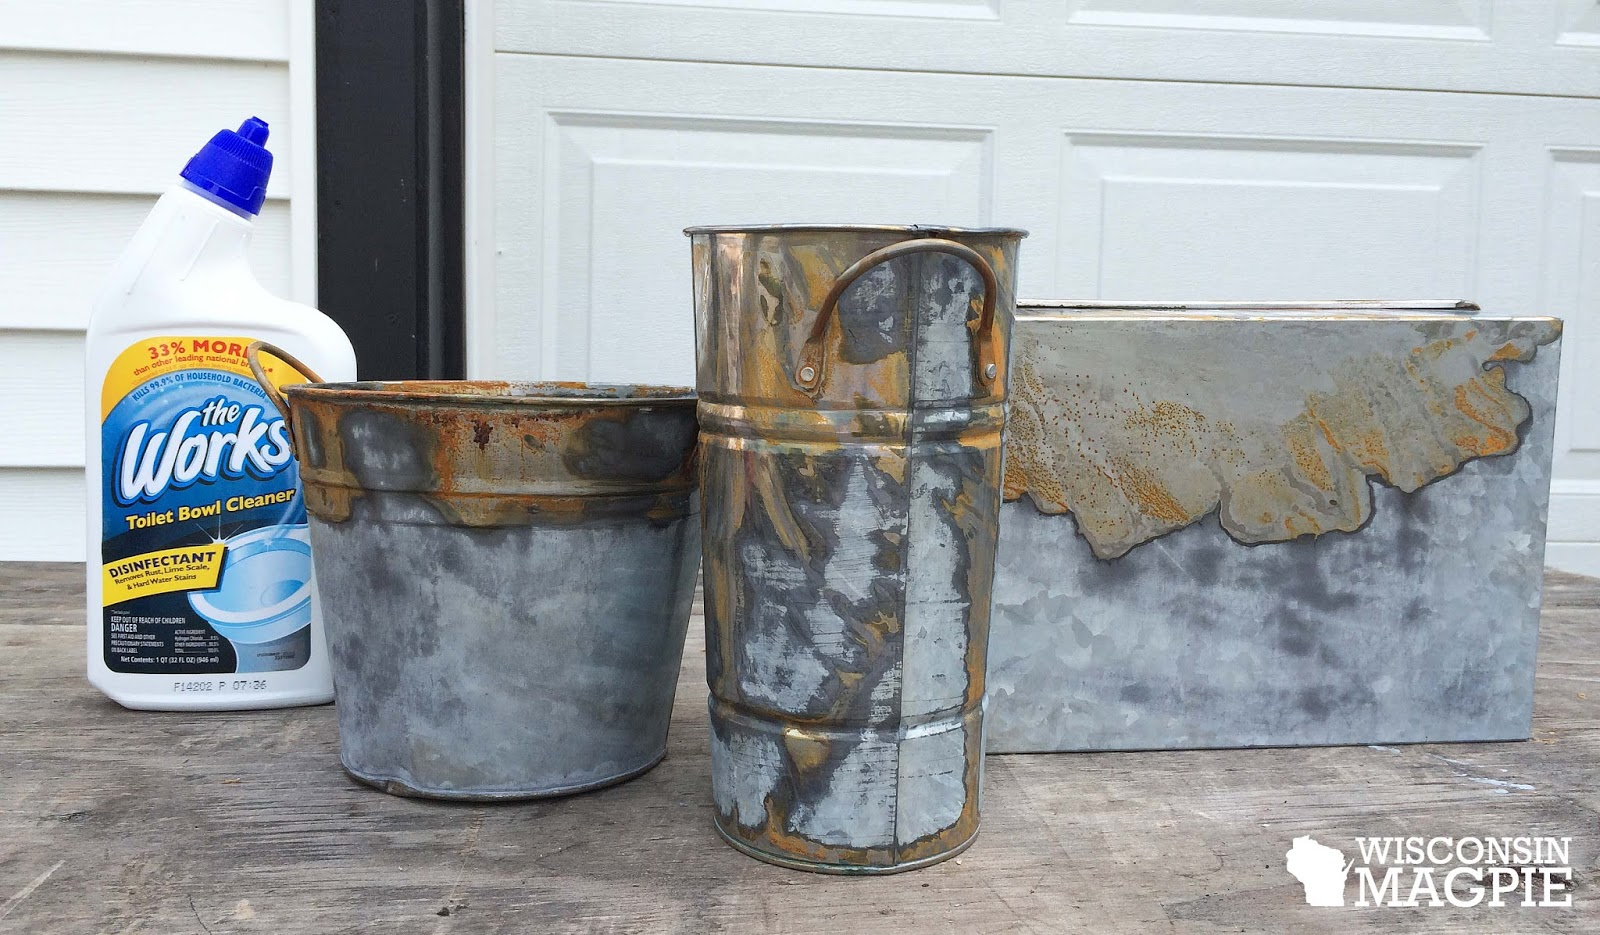 Wisconsin Magpie: De-shining galvanized metal